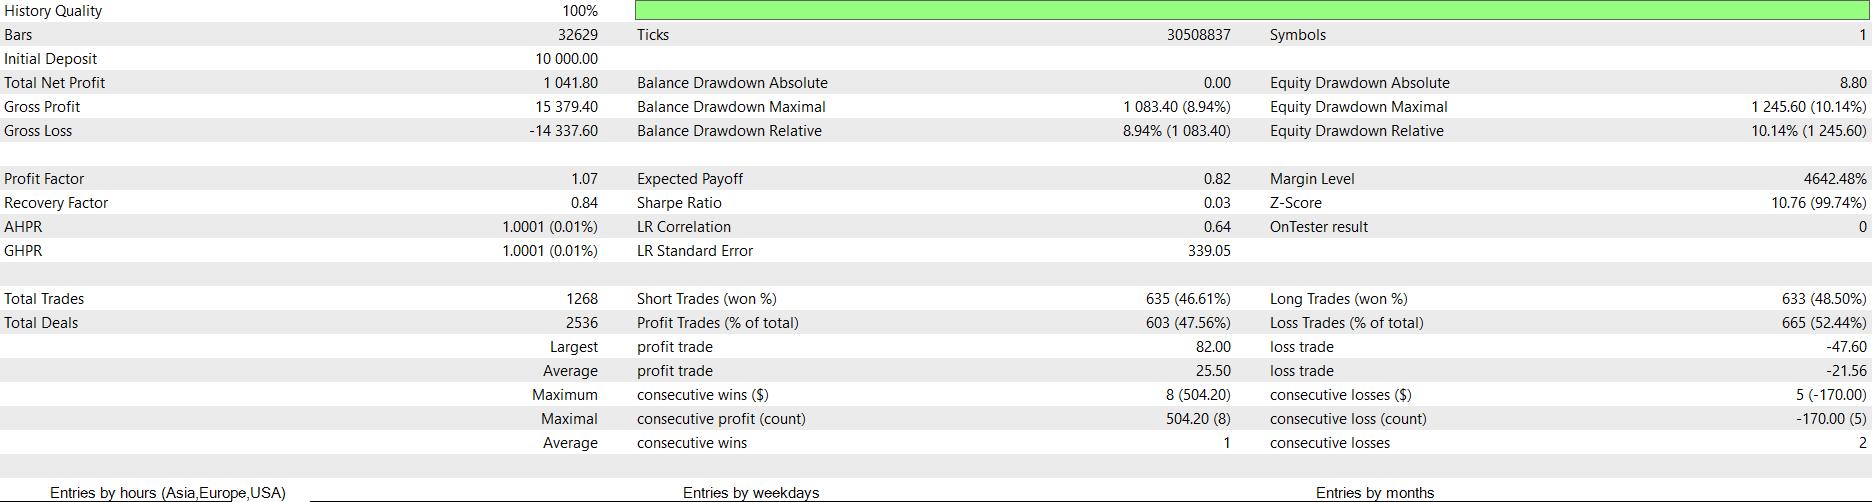 Kết quả backtest của FXCE EA GridReverse